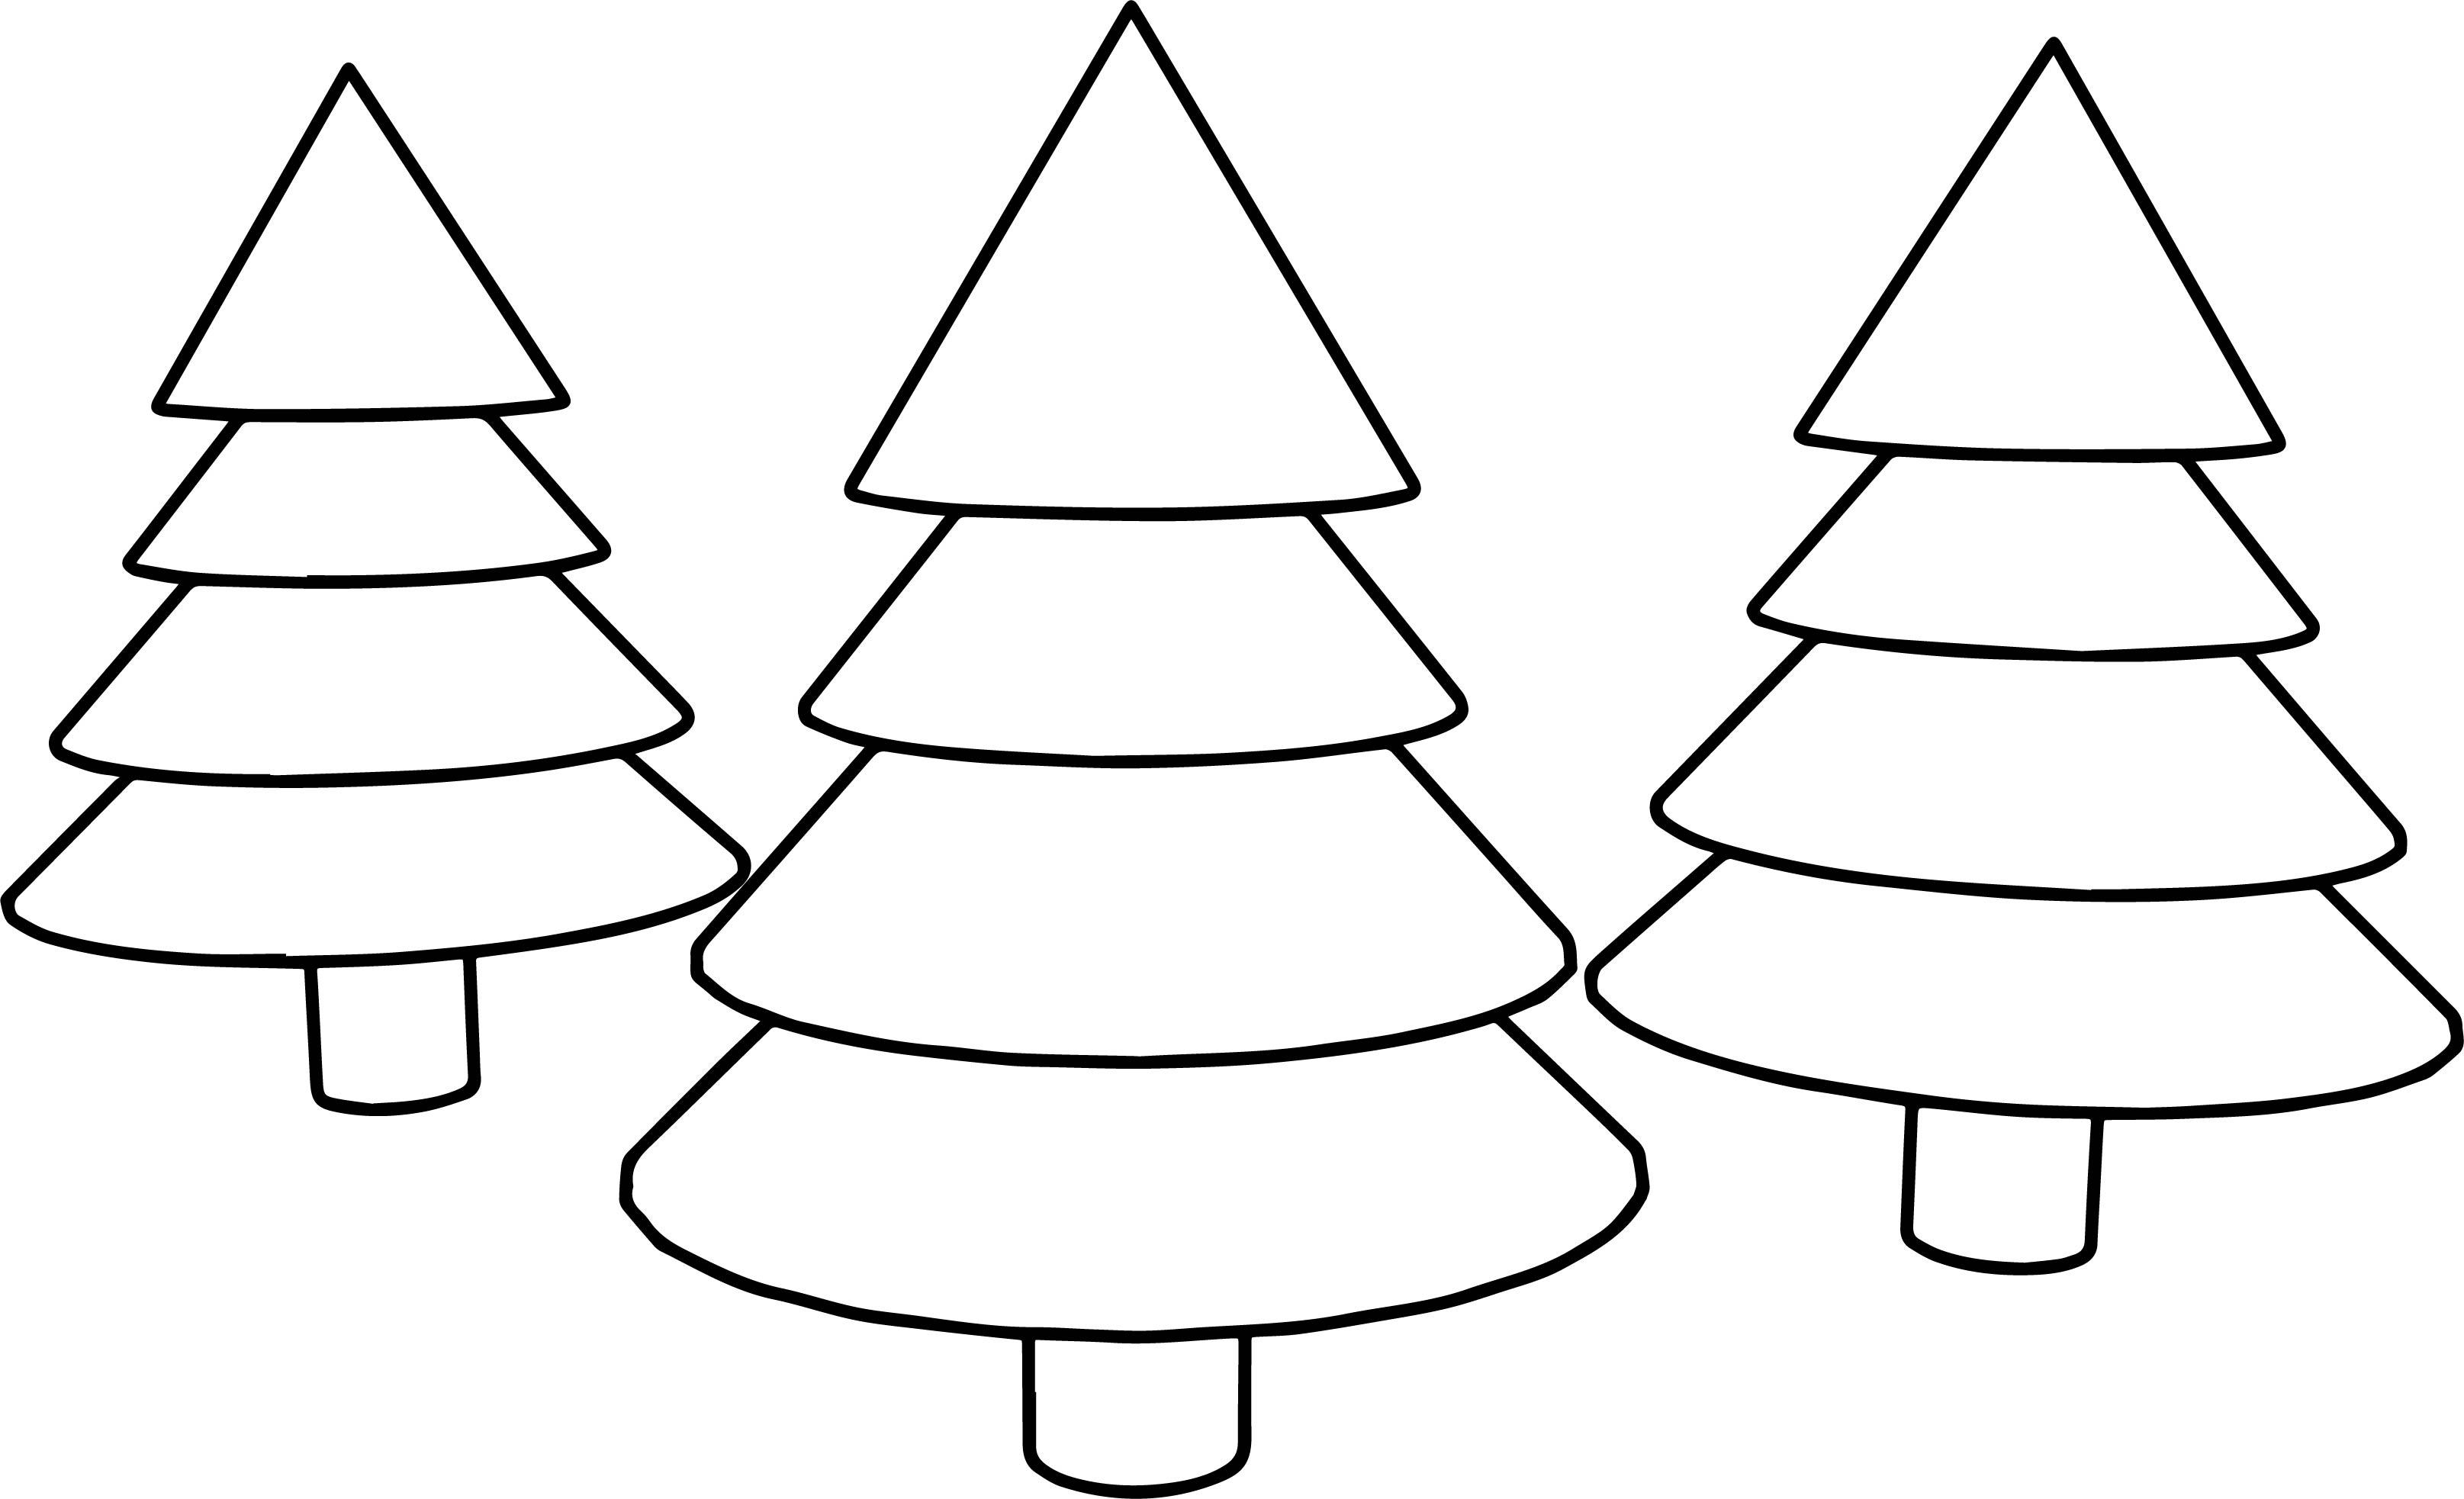 cartoon tree coloring page